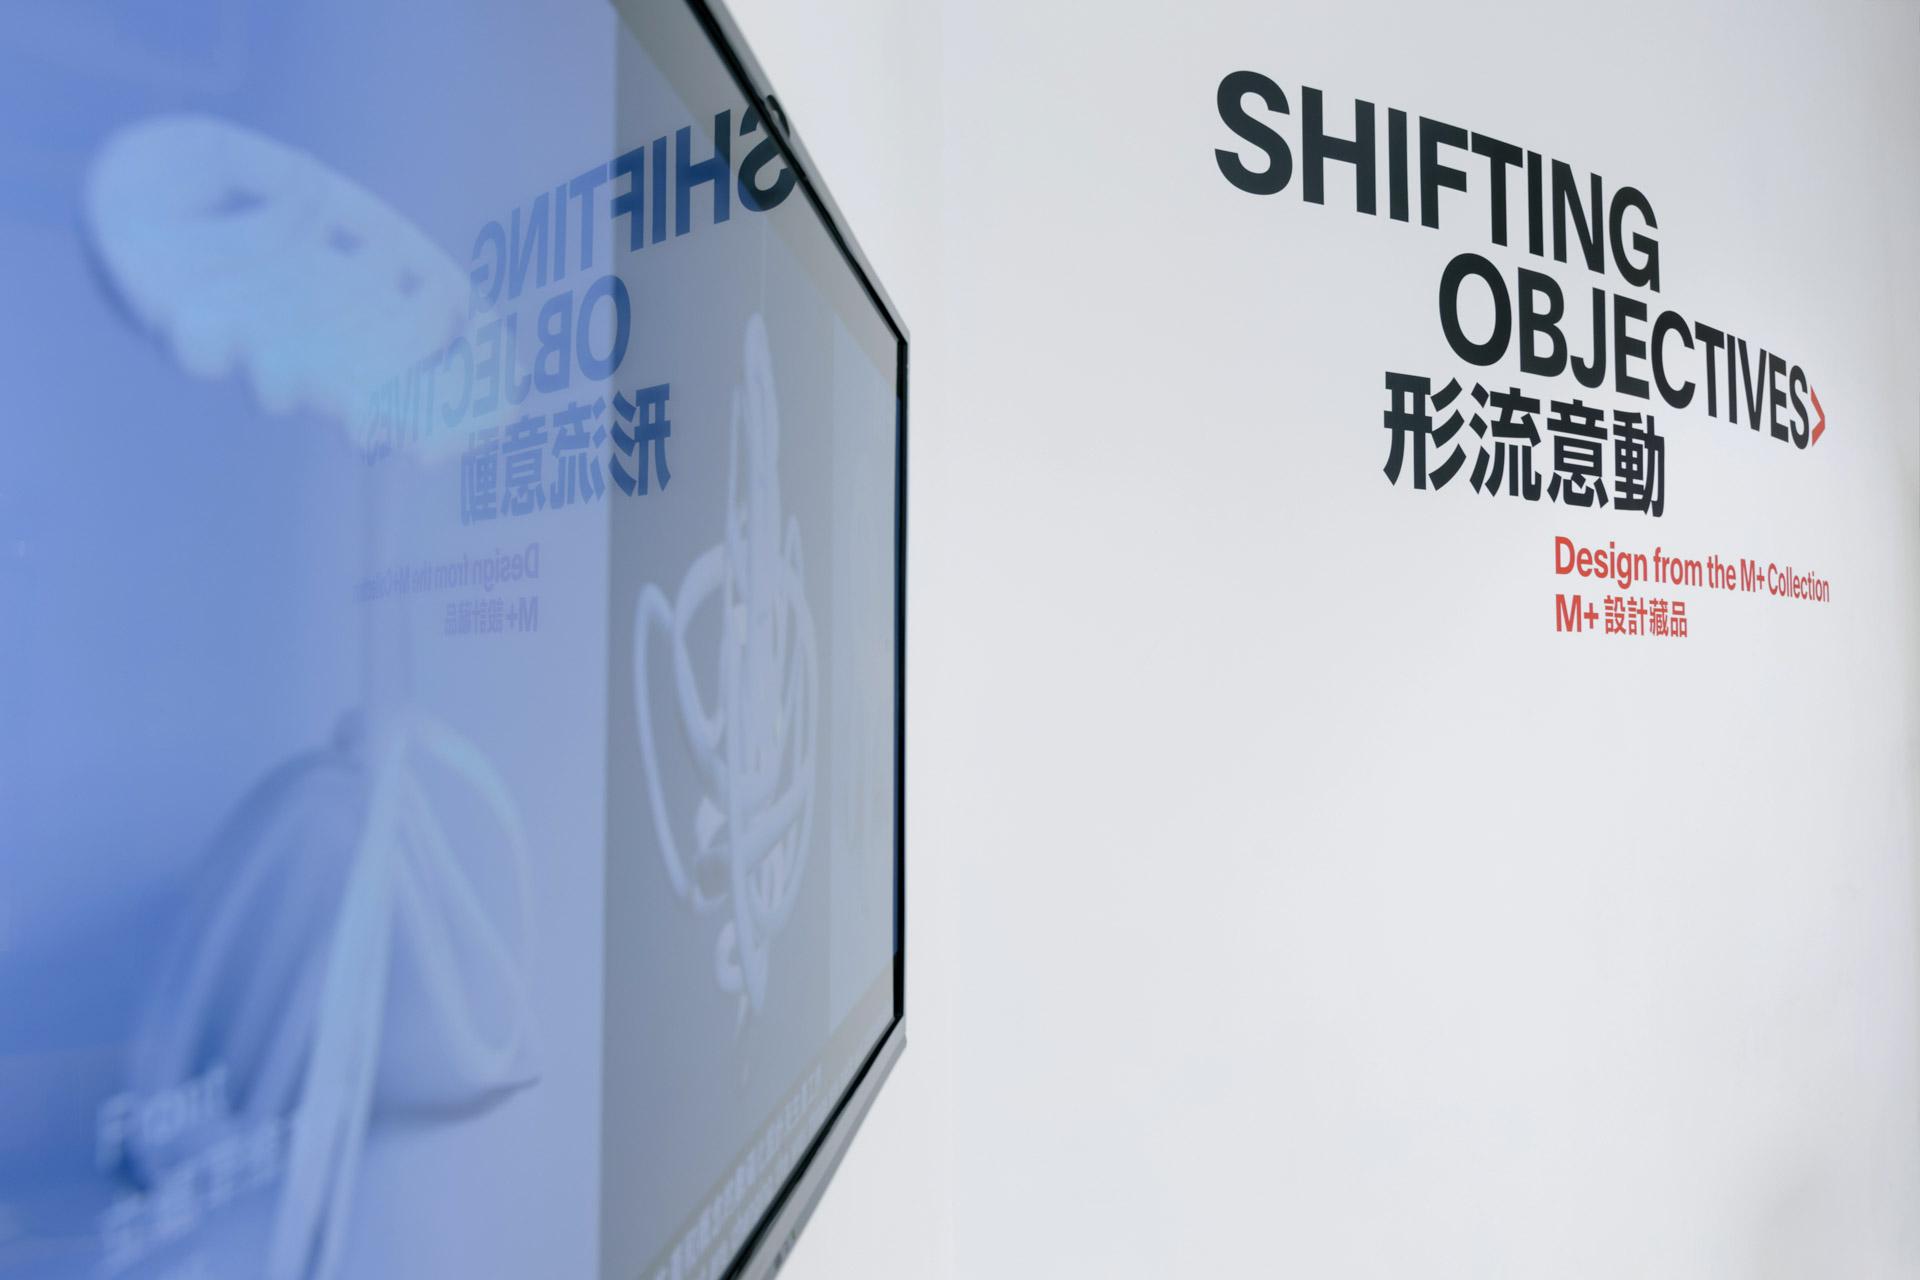 shifting-objectives_24